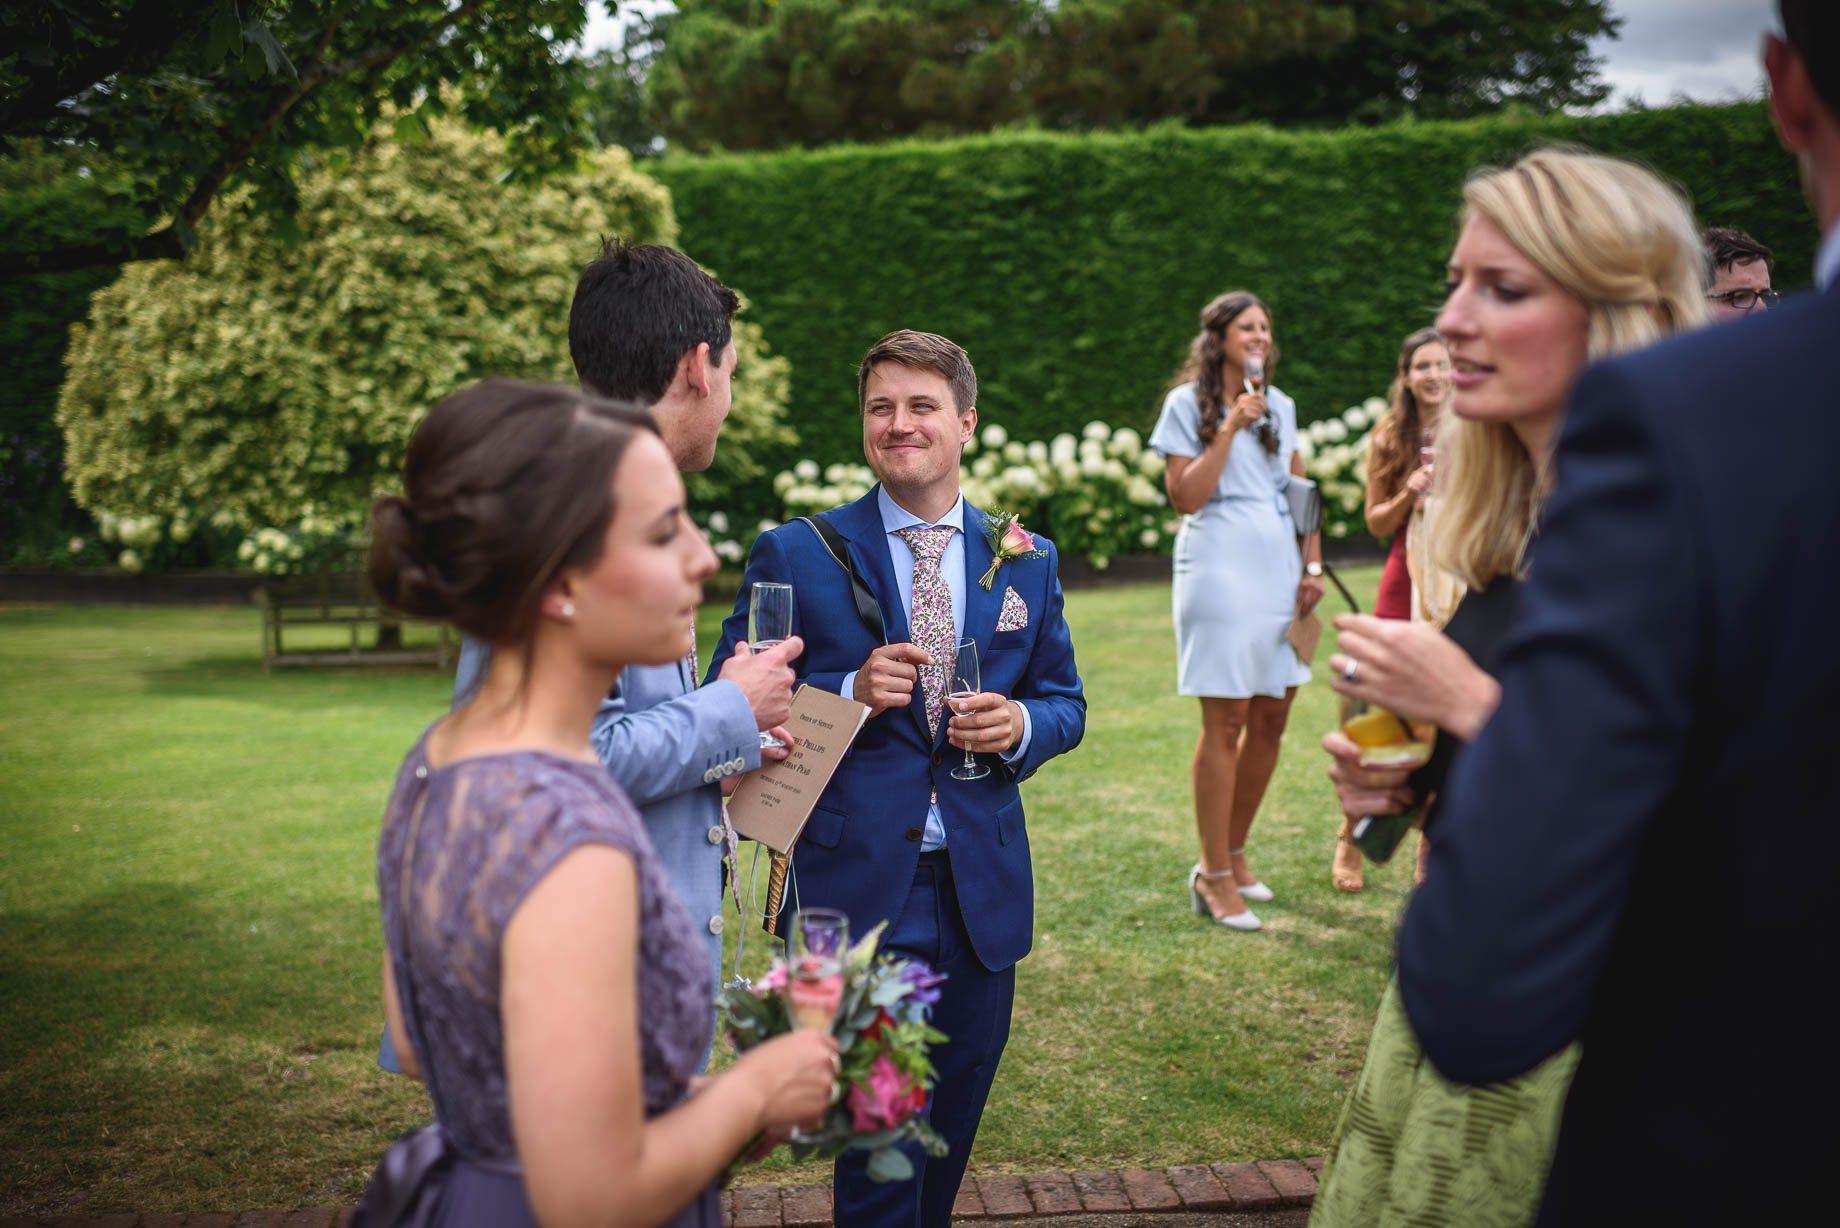 Gaynes Park wedding photography - Guy Collier Photography - Rachel and Jon (85 of 169)